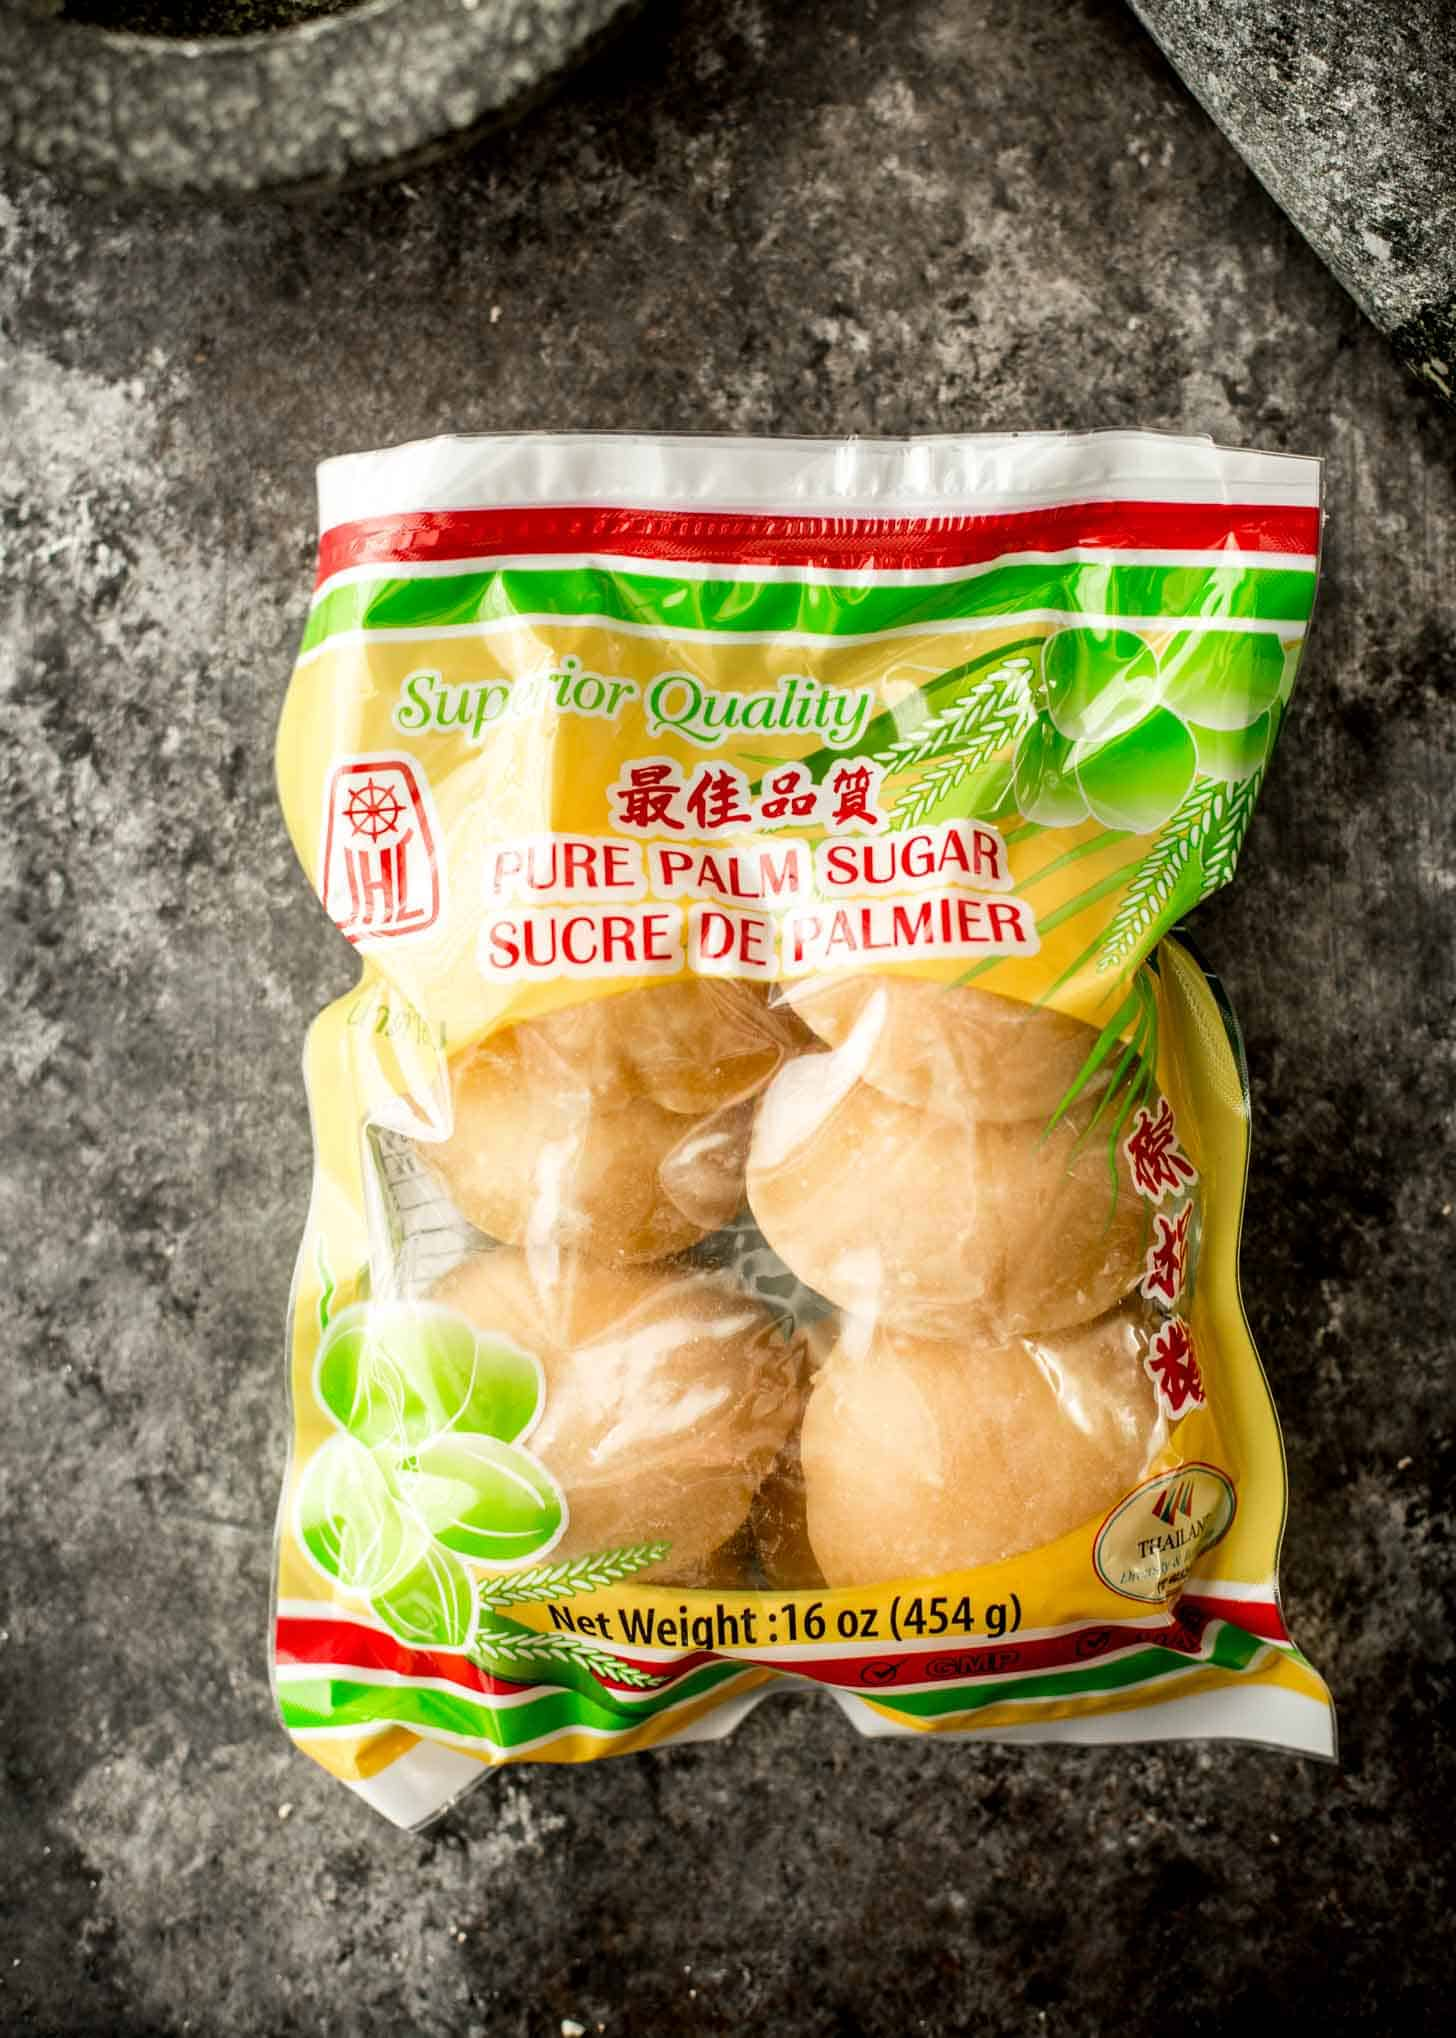 a bag of palm sugar on a grey countertop